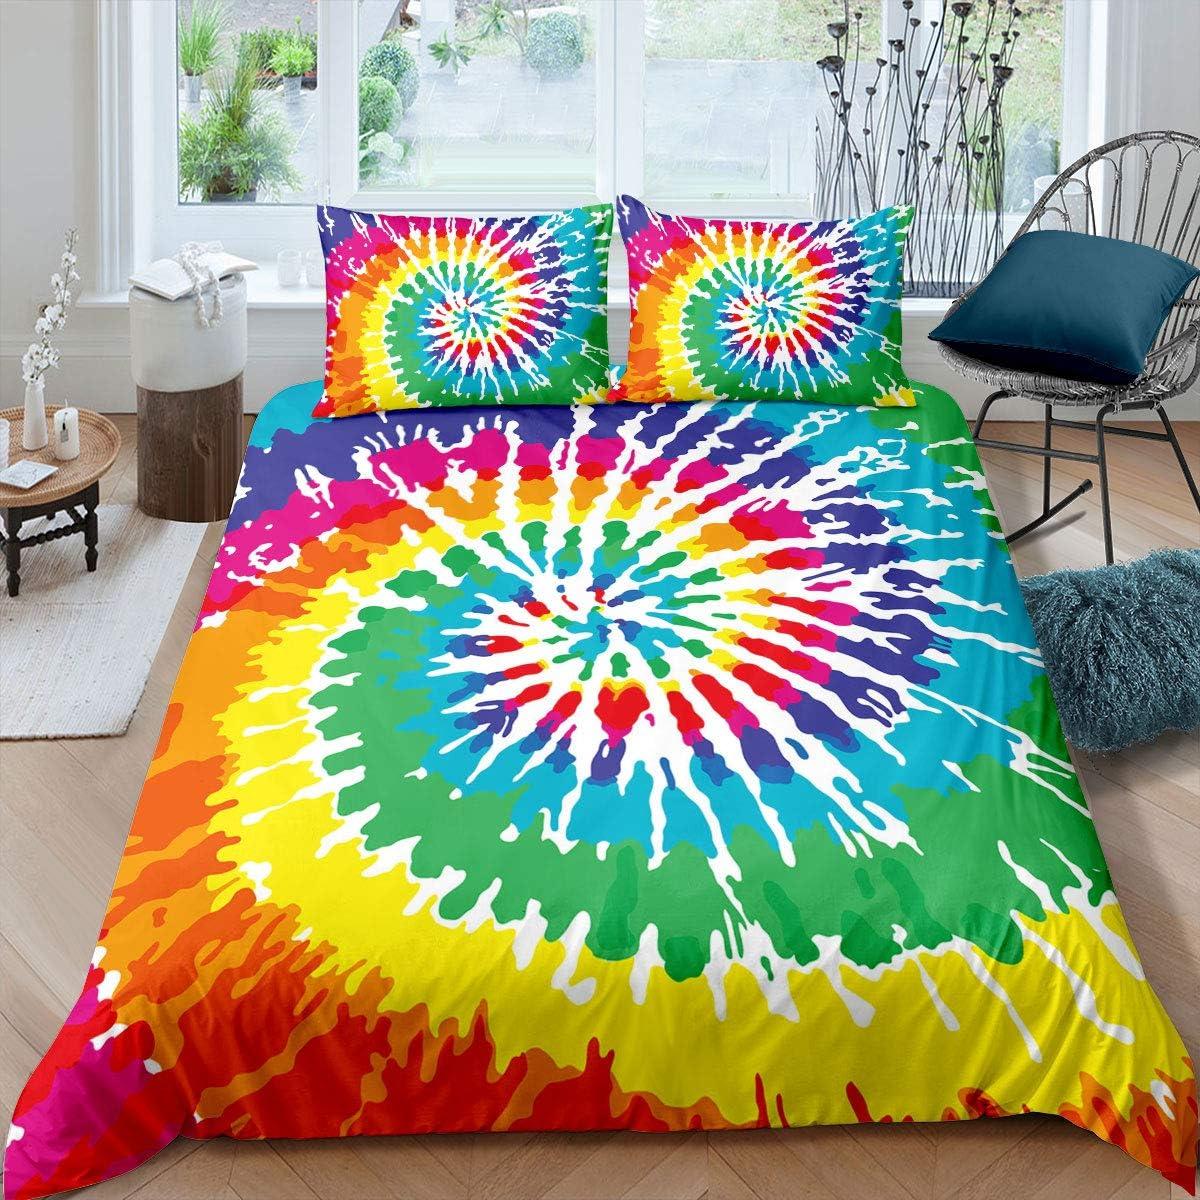 Erosebridal Tie Dye Bedding Albuquerque Mall Sales results No. 1 Size Queen Colorful Rainbow